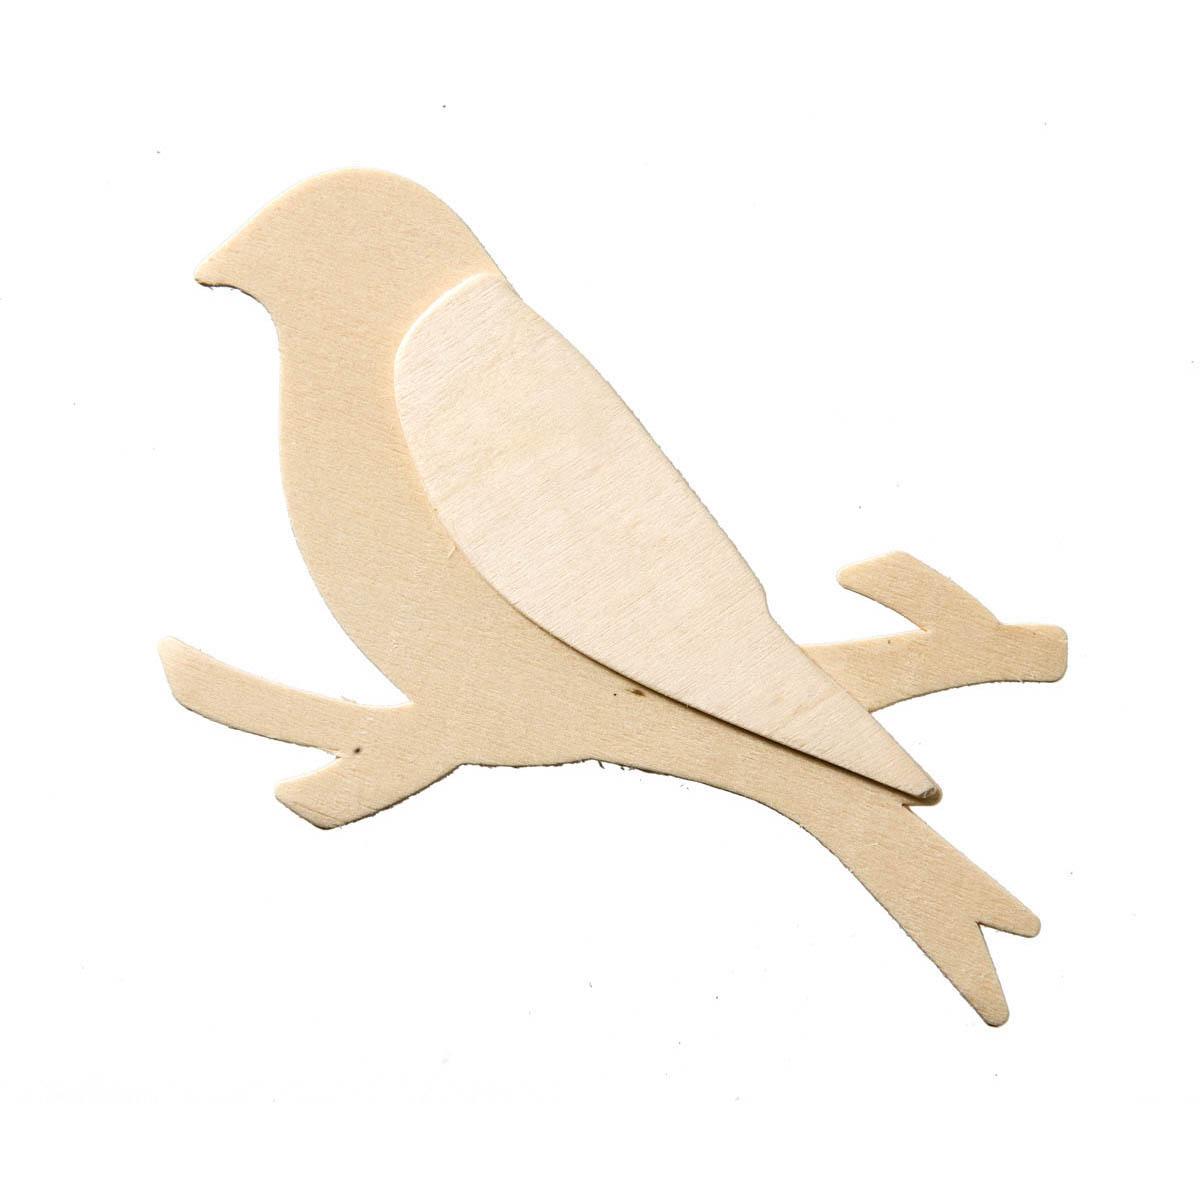 UNPAINTED WOOD SHAPE - BIRD